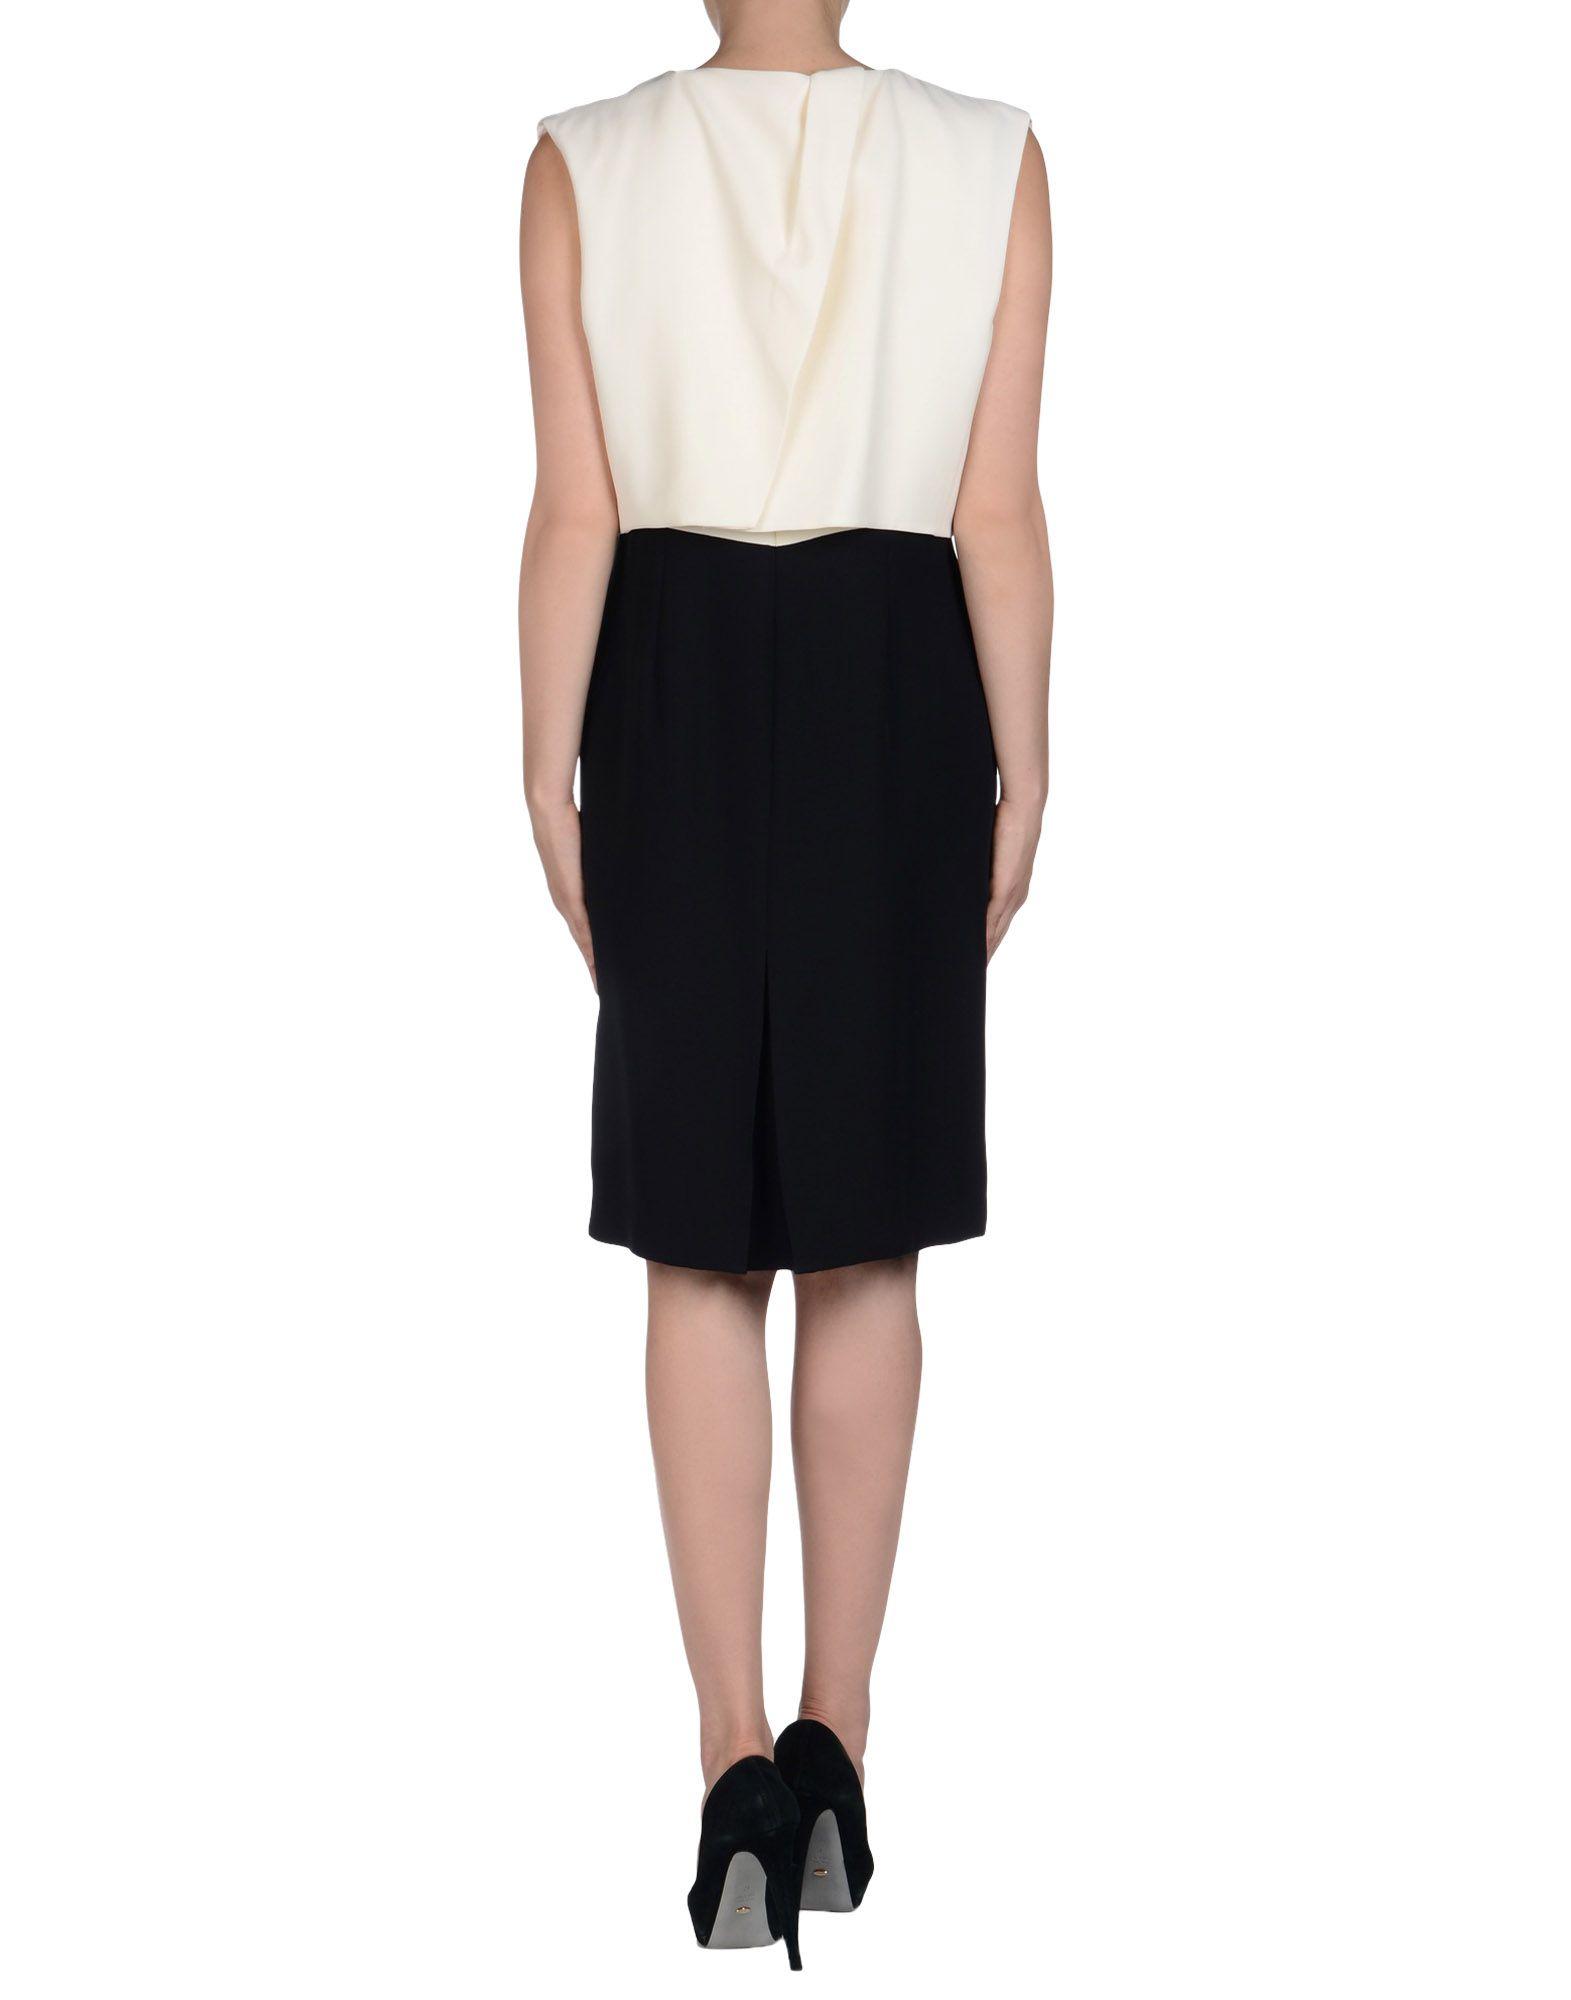 dior short dresses - photo #23